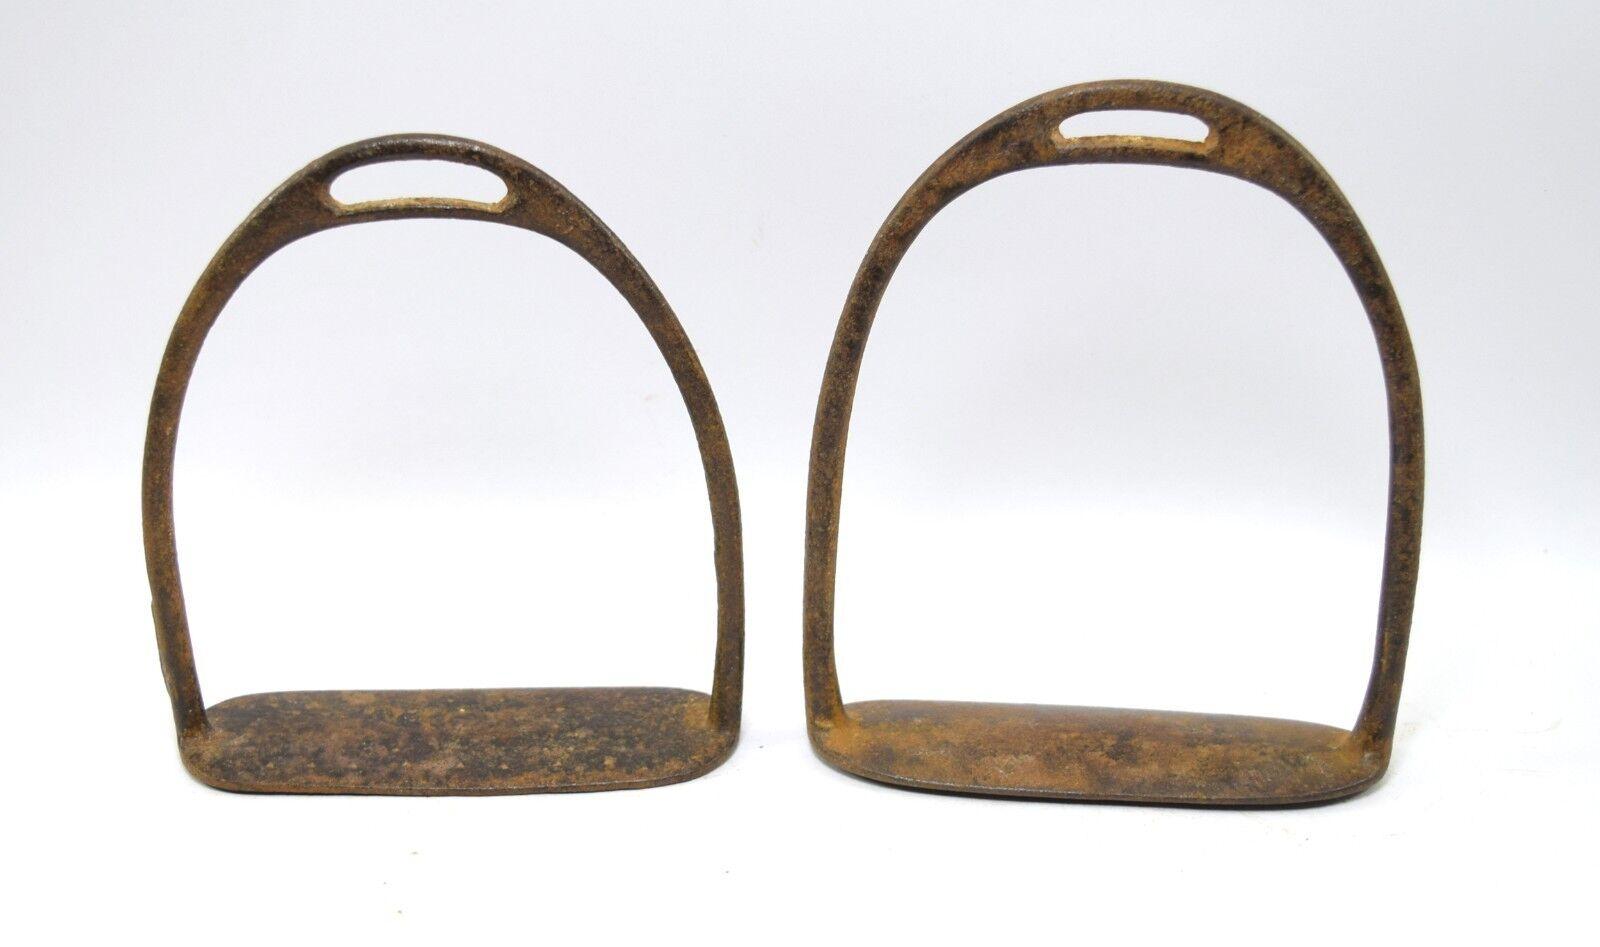 Pedal De De Pedal Caballo De Buena Vintage Coleccionables estribo Par Granja nos Decoración. G42-165 584421